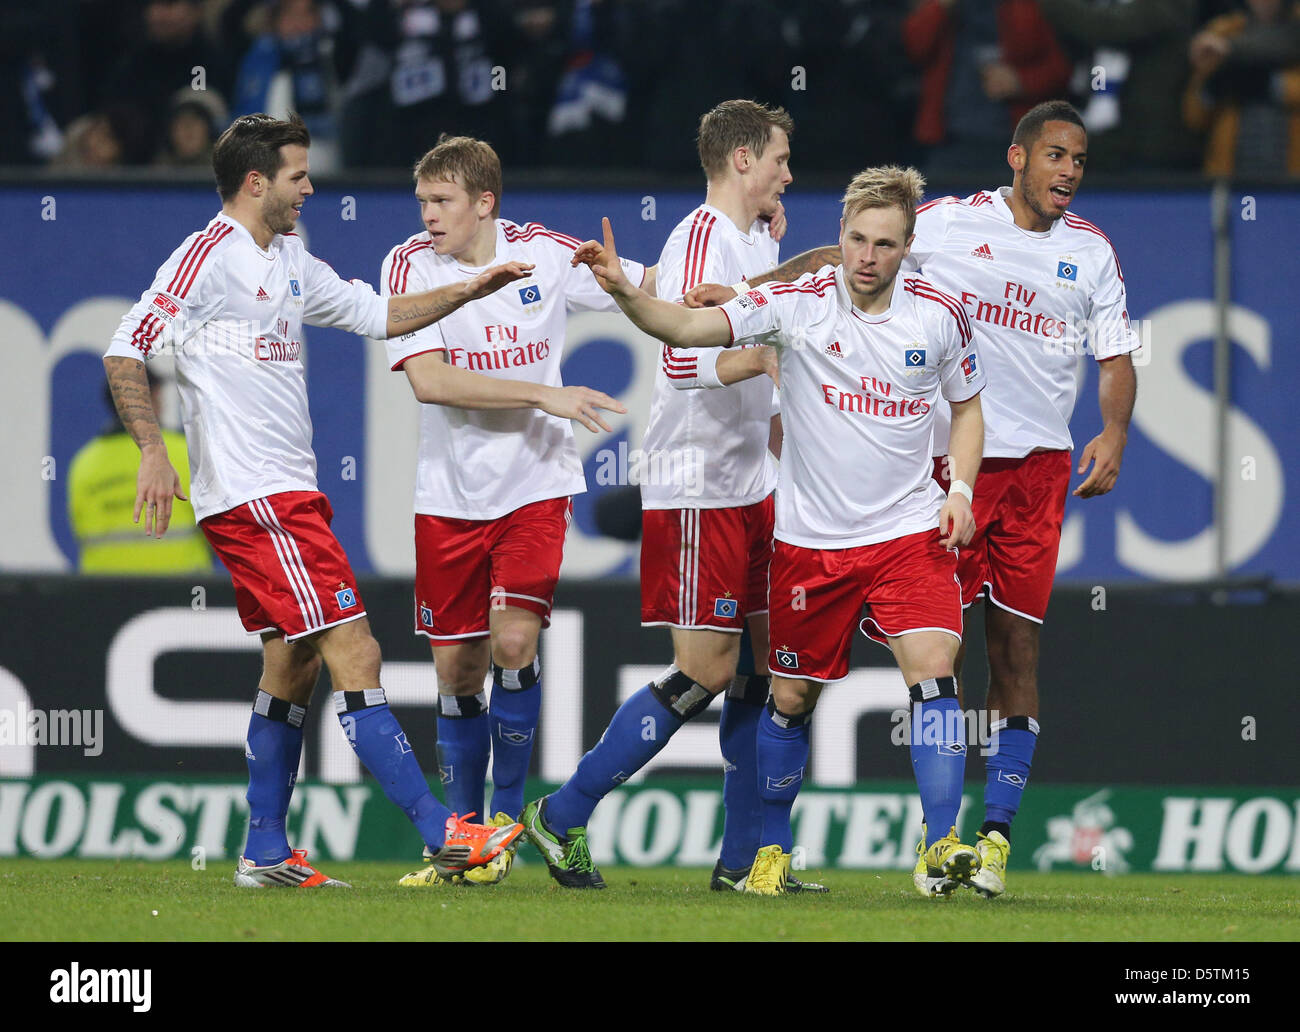 Hamburg's Maximilian Beister (2-R) celebrates his 1-0 goal with his teammates during the German Bundesliga match - Stock Image